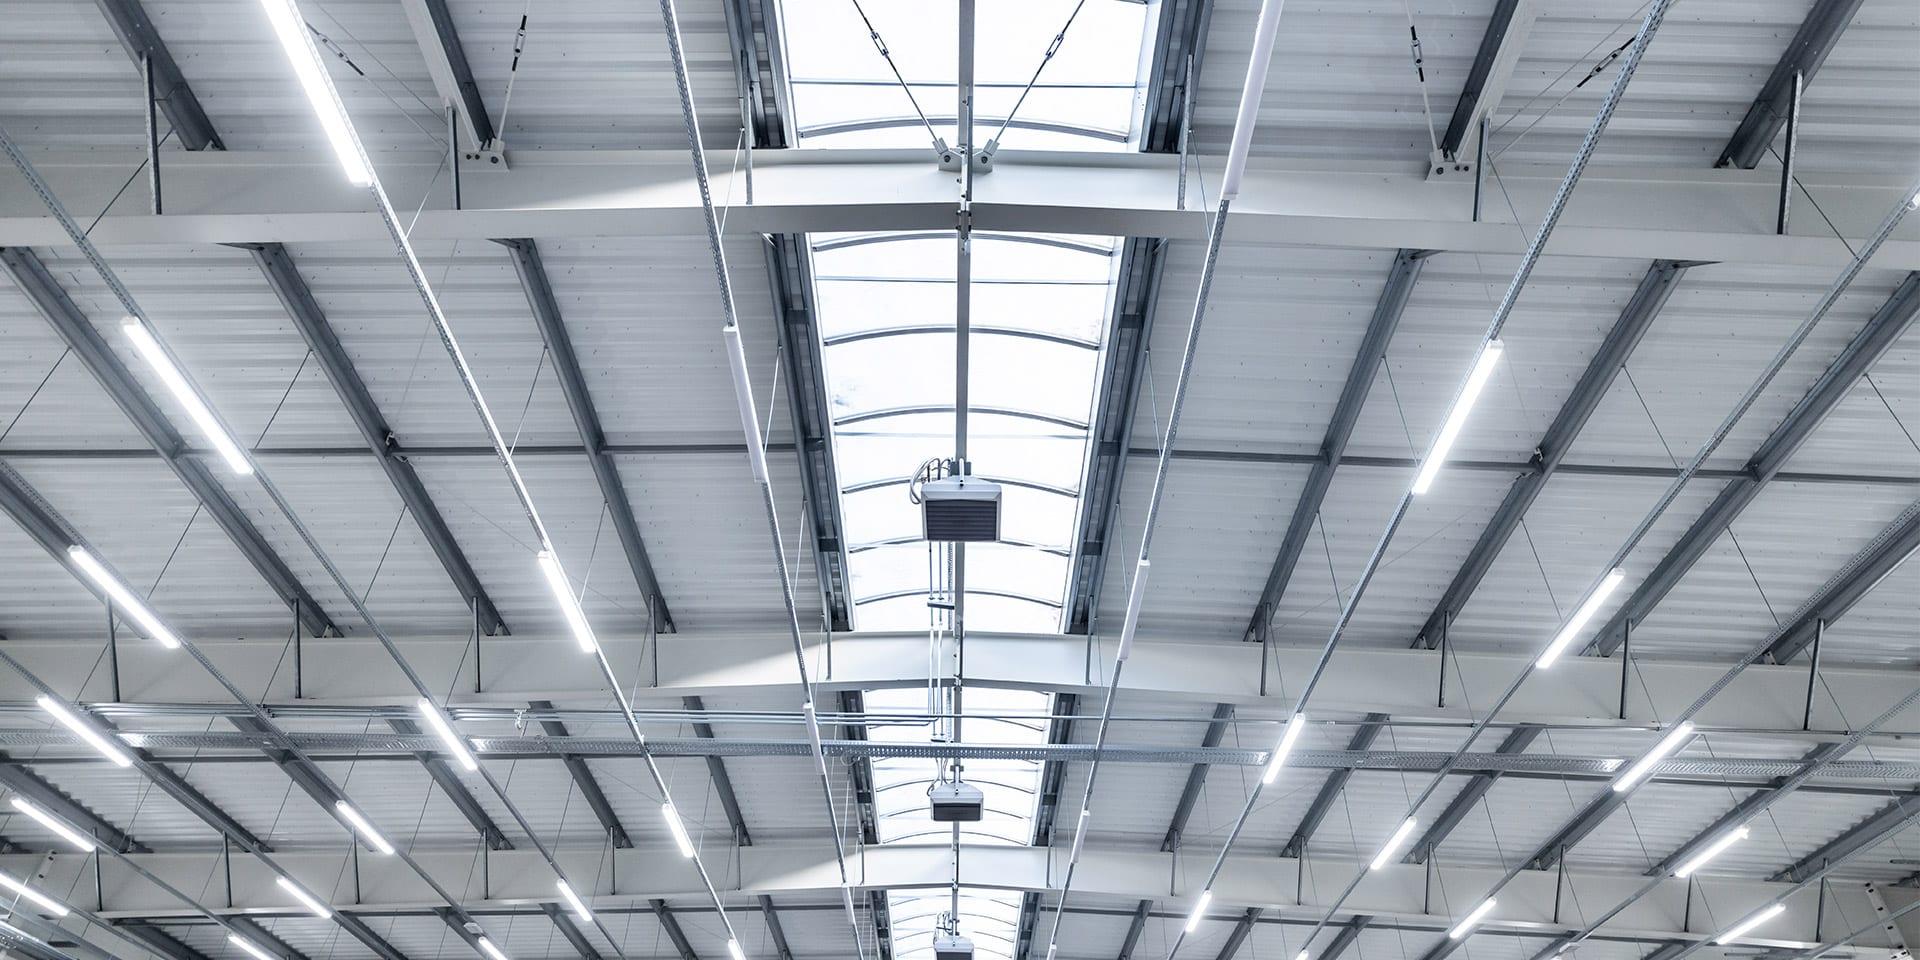 LED Lighting and Sensor Backed Controls